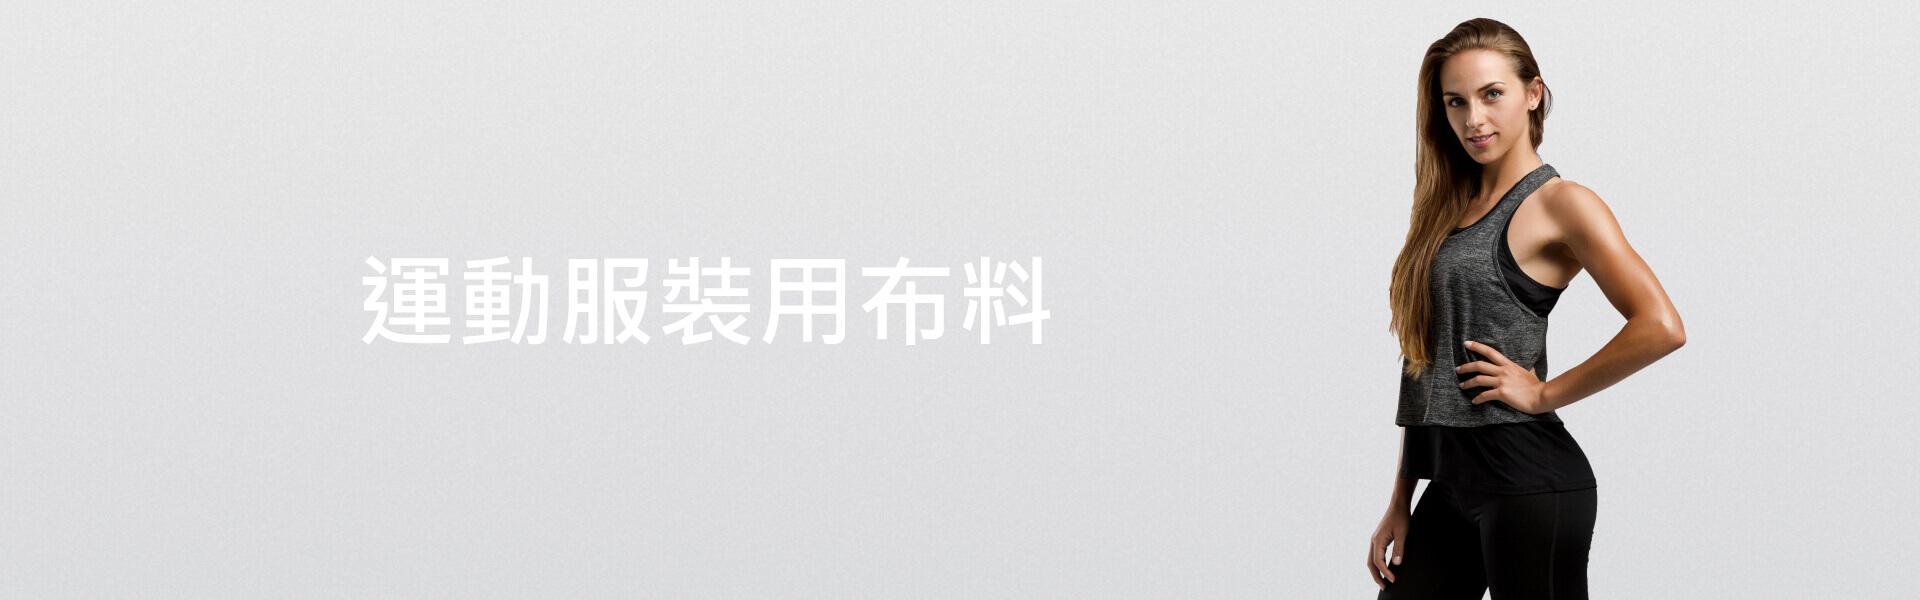 Catagory-sportswear-zh